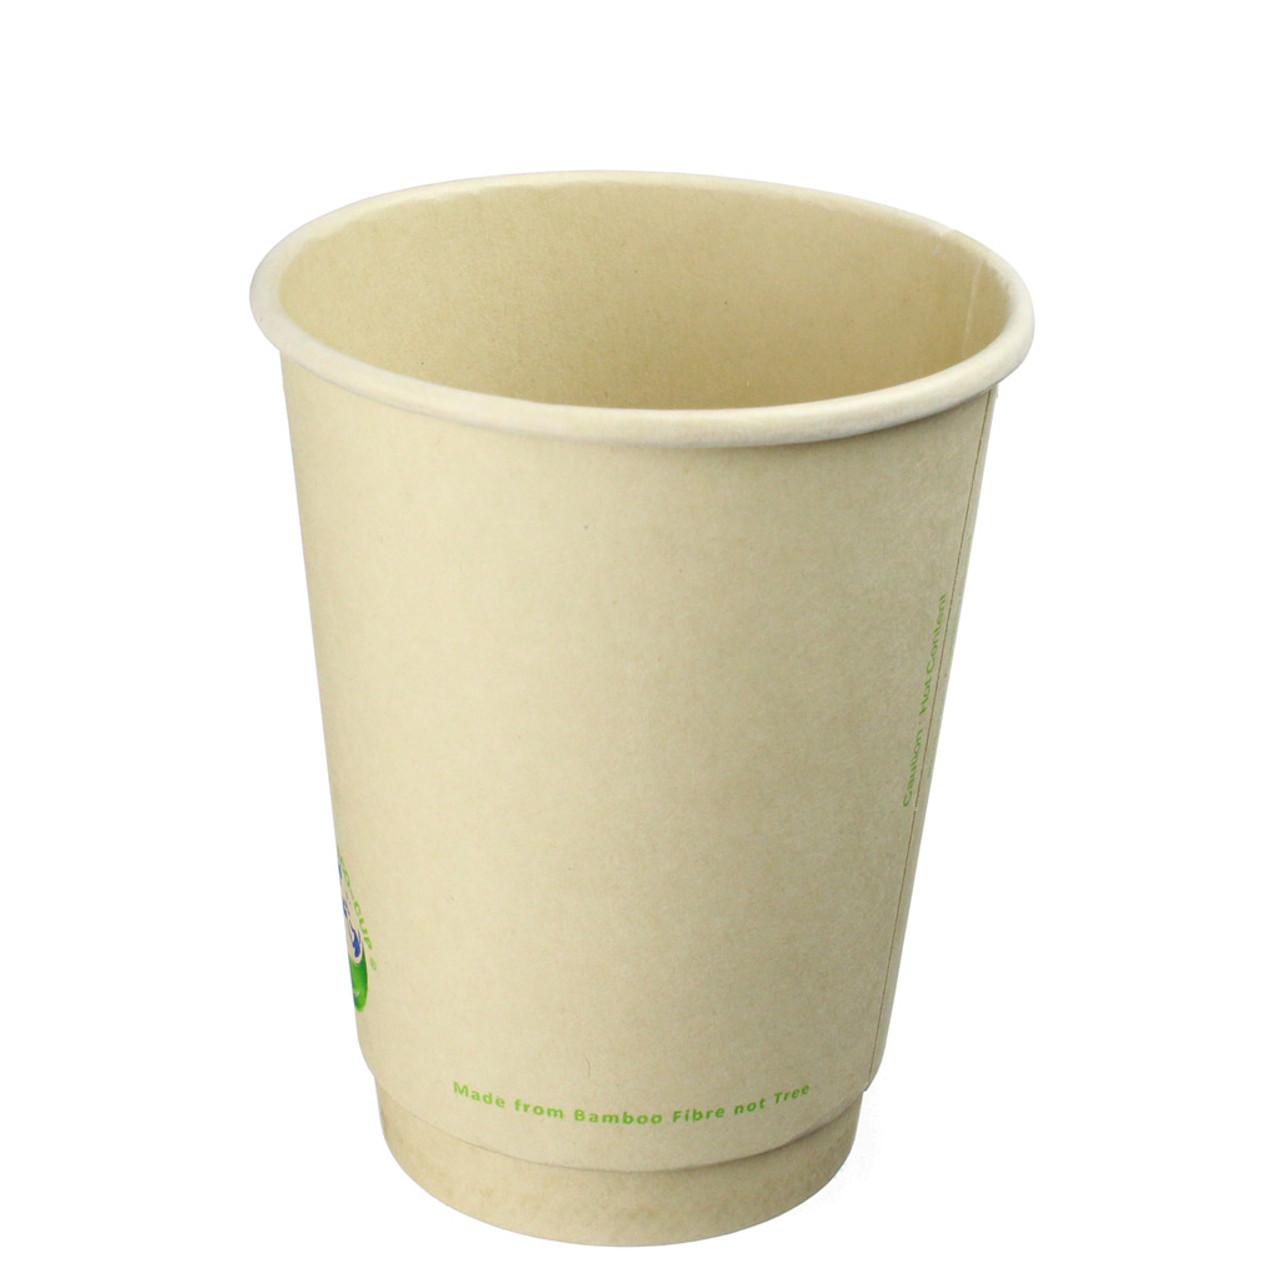 12oz Bamboo Fiber Biodegradable Hot Cups